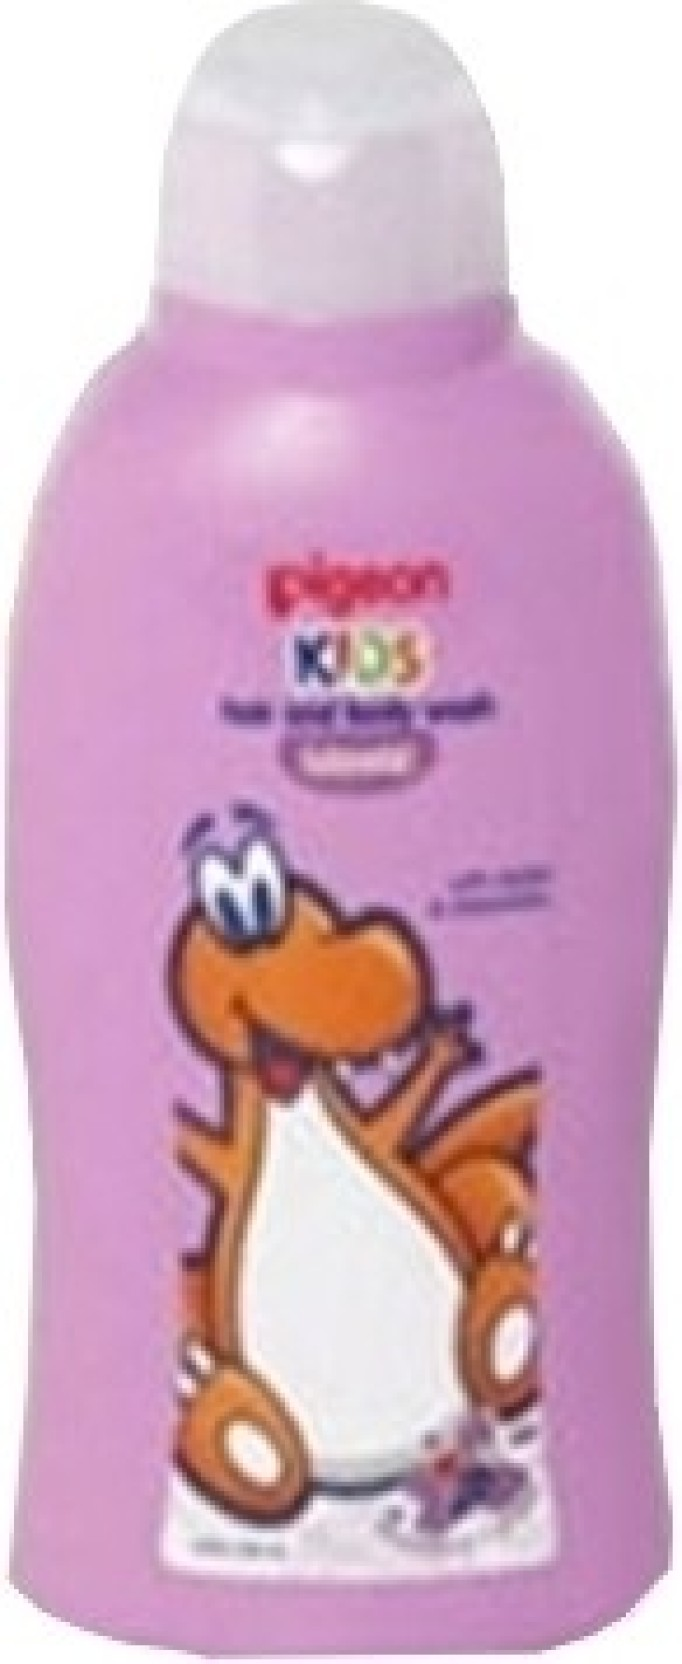 Pigeon Kids Hair And Body Wash Liquid Strawberry Grape 400ml Spec Kewpie Baby Foaming Soap Refill 350ml Toiletry Share